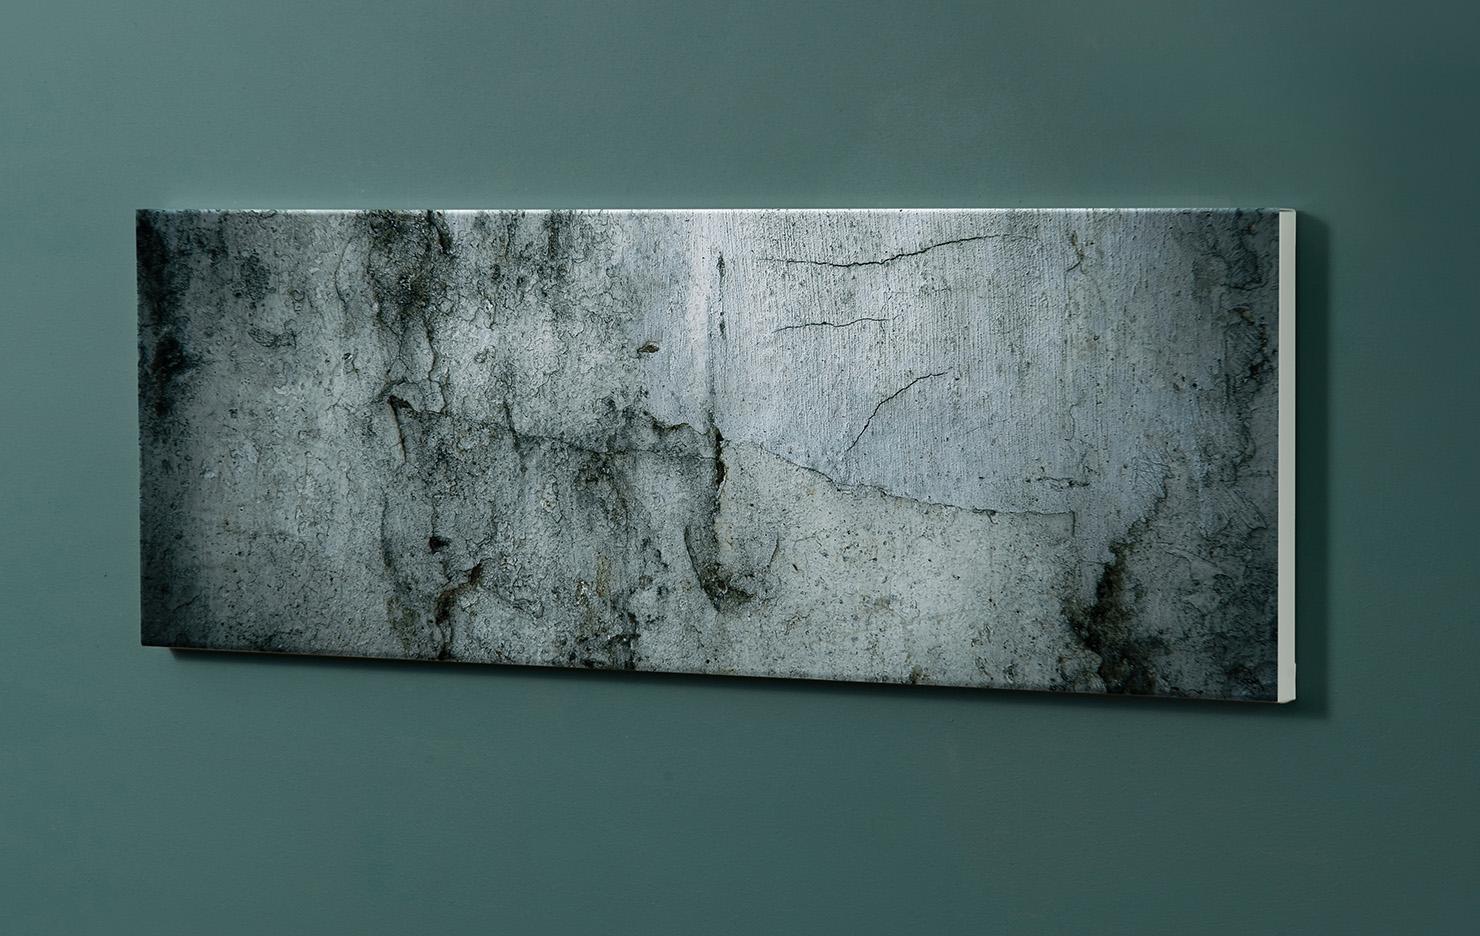 Magnettafel NOTIZ 90x30cm Motiv-Pinnwand M03 Beton